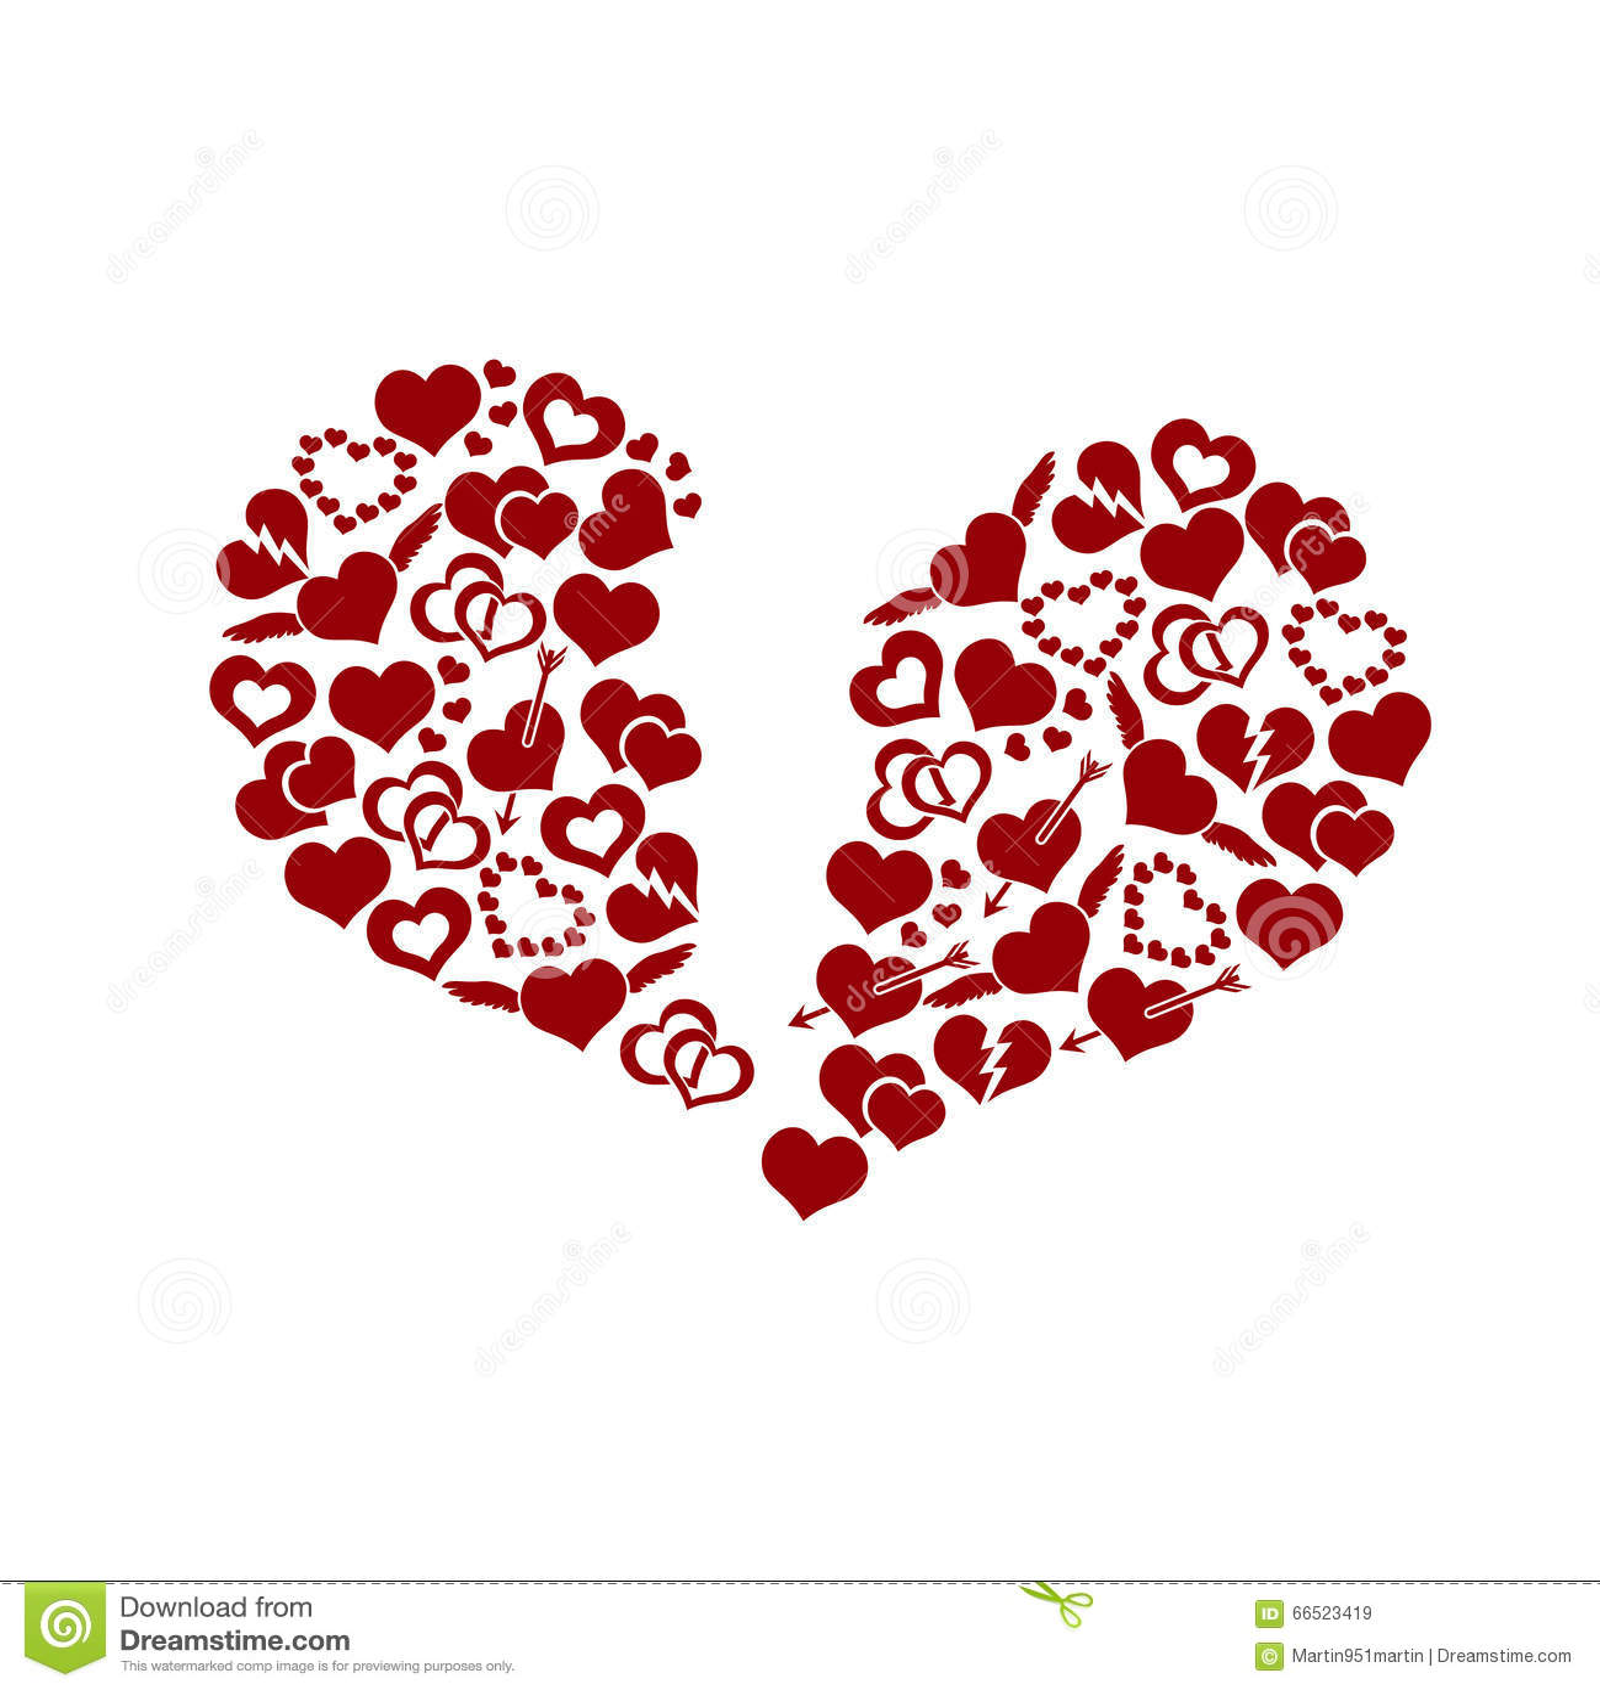 Red valentine broken hearth love symbols in big hearth shape eps10 red valentine broken hearth love symbols in big hearth shape eps10 biocorpaavc Images